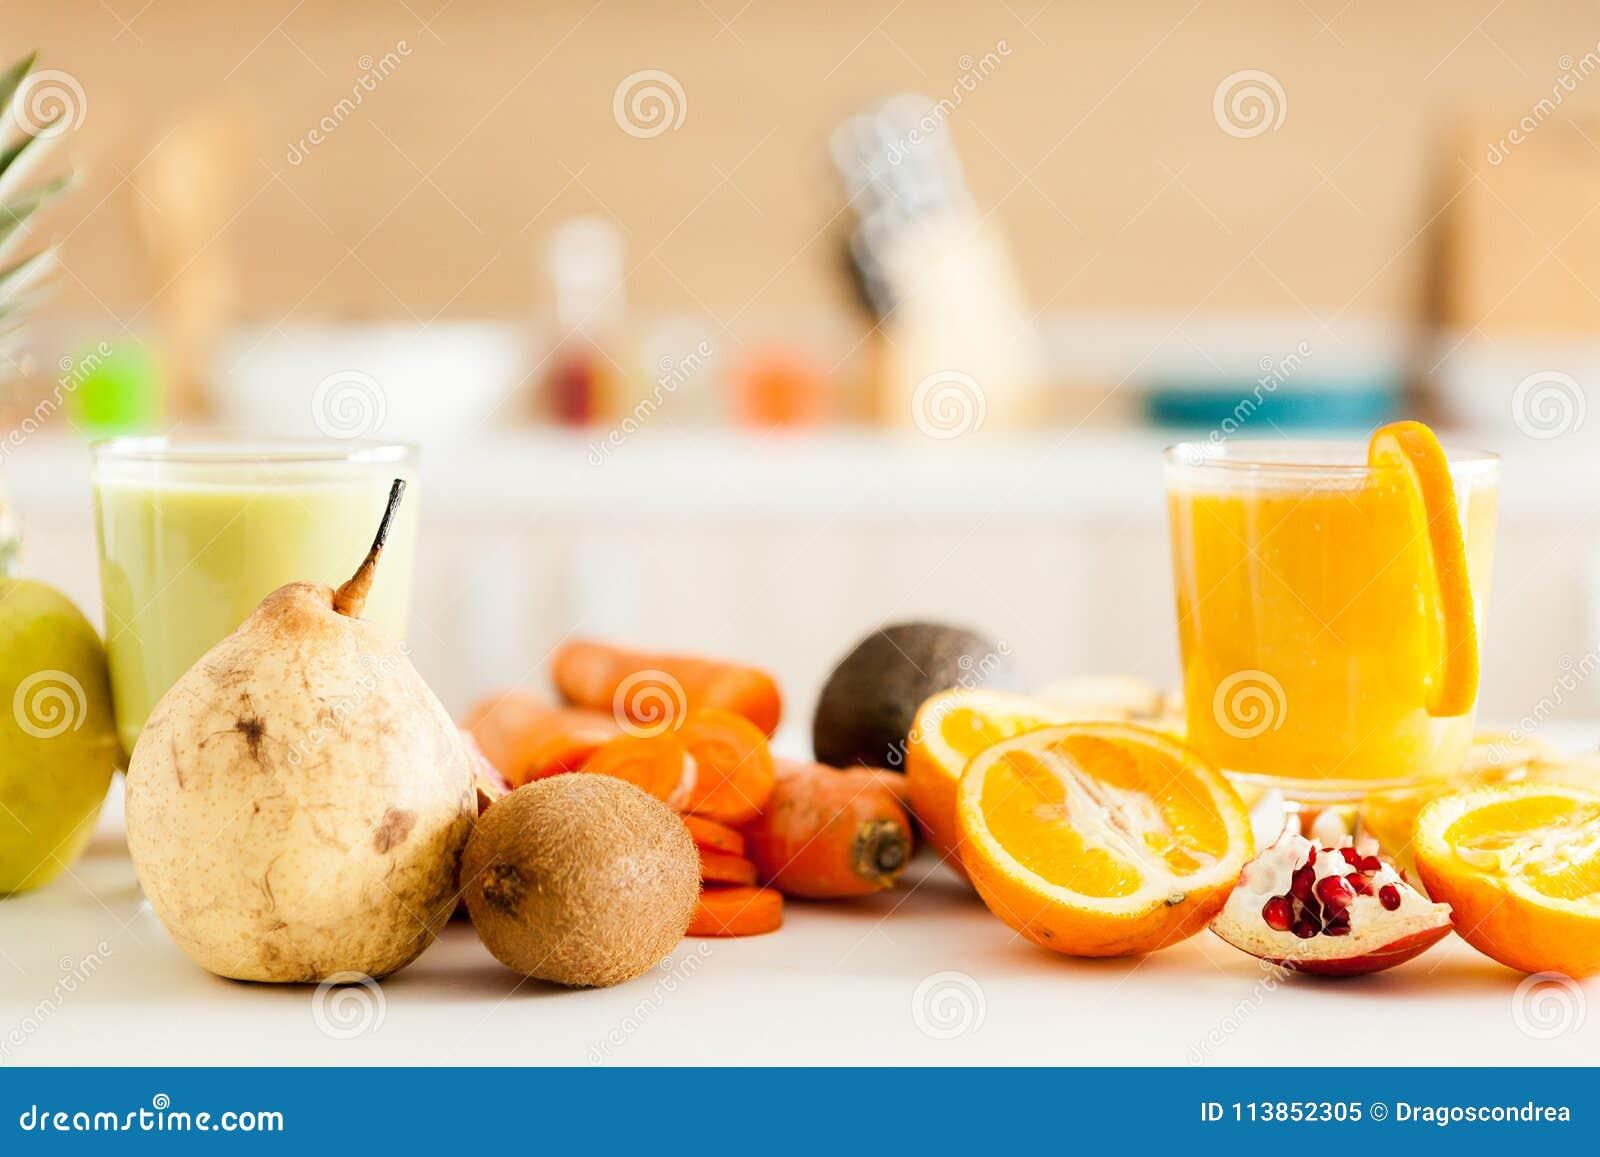 Healthy and delicious organic juice